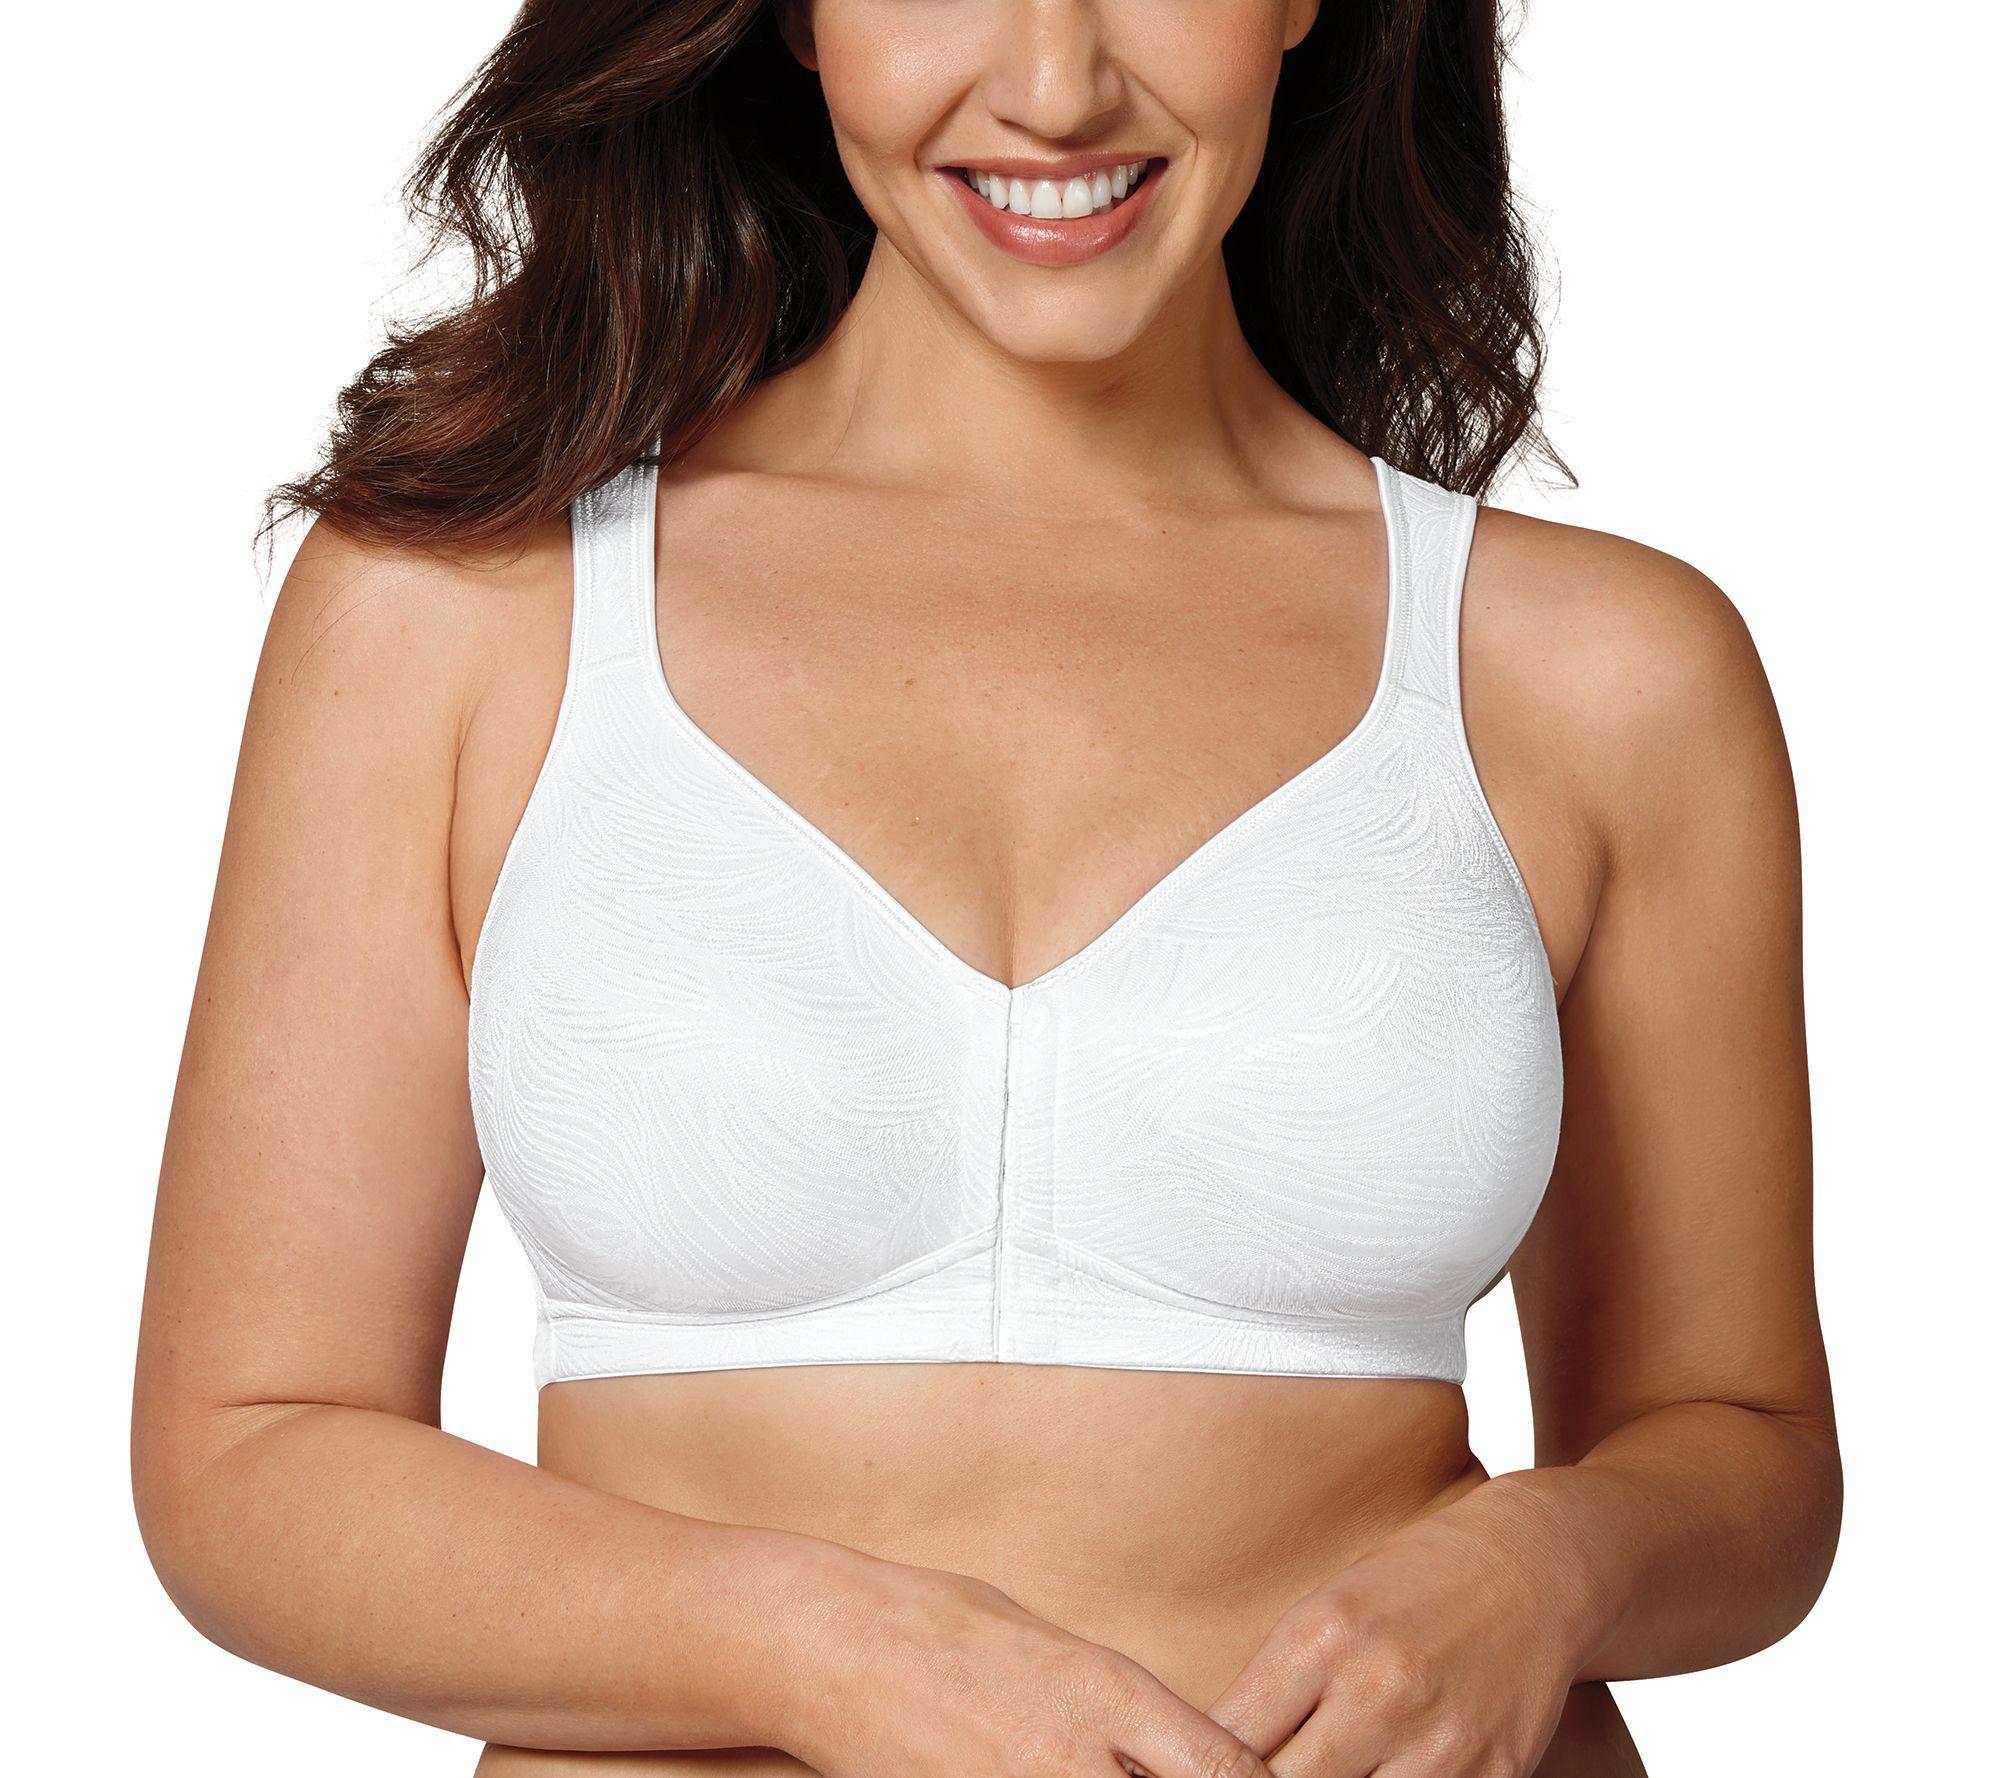 Playtex Womens 18 Hour Easy on Easy Off Seamless Wirefree Mastectomy Bra Full Coverage Bra